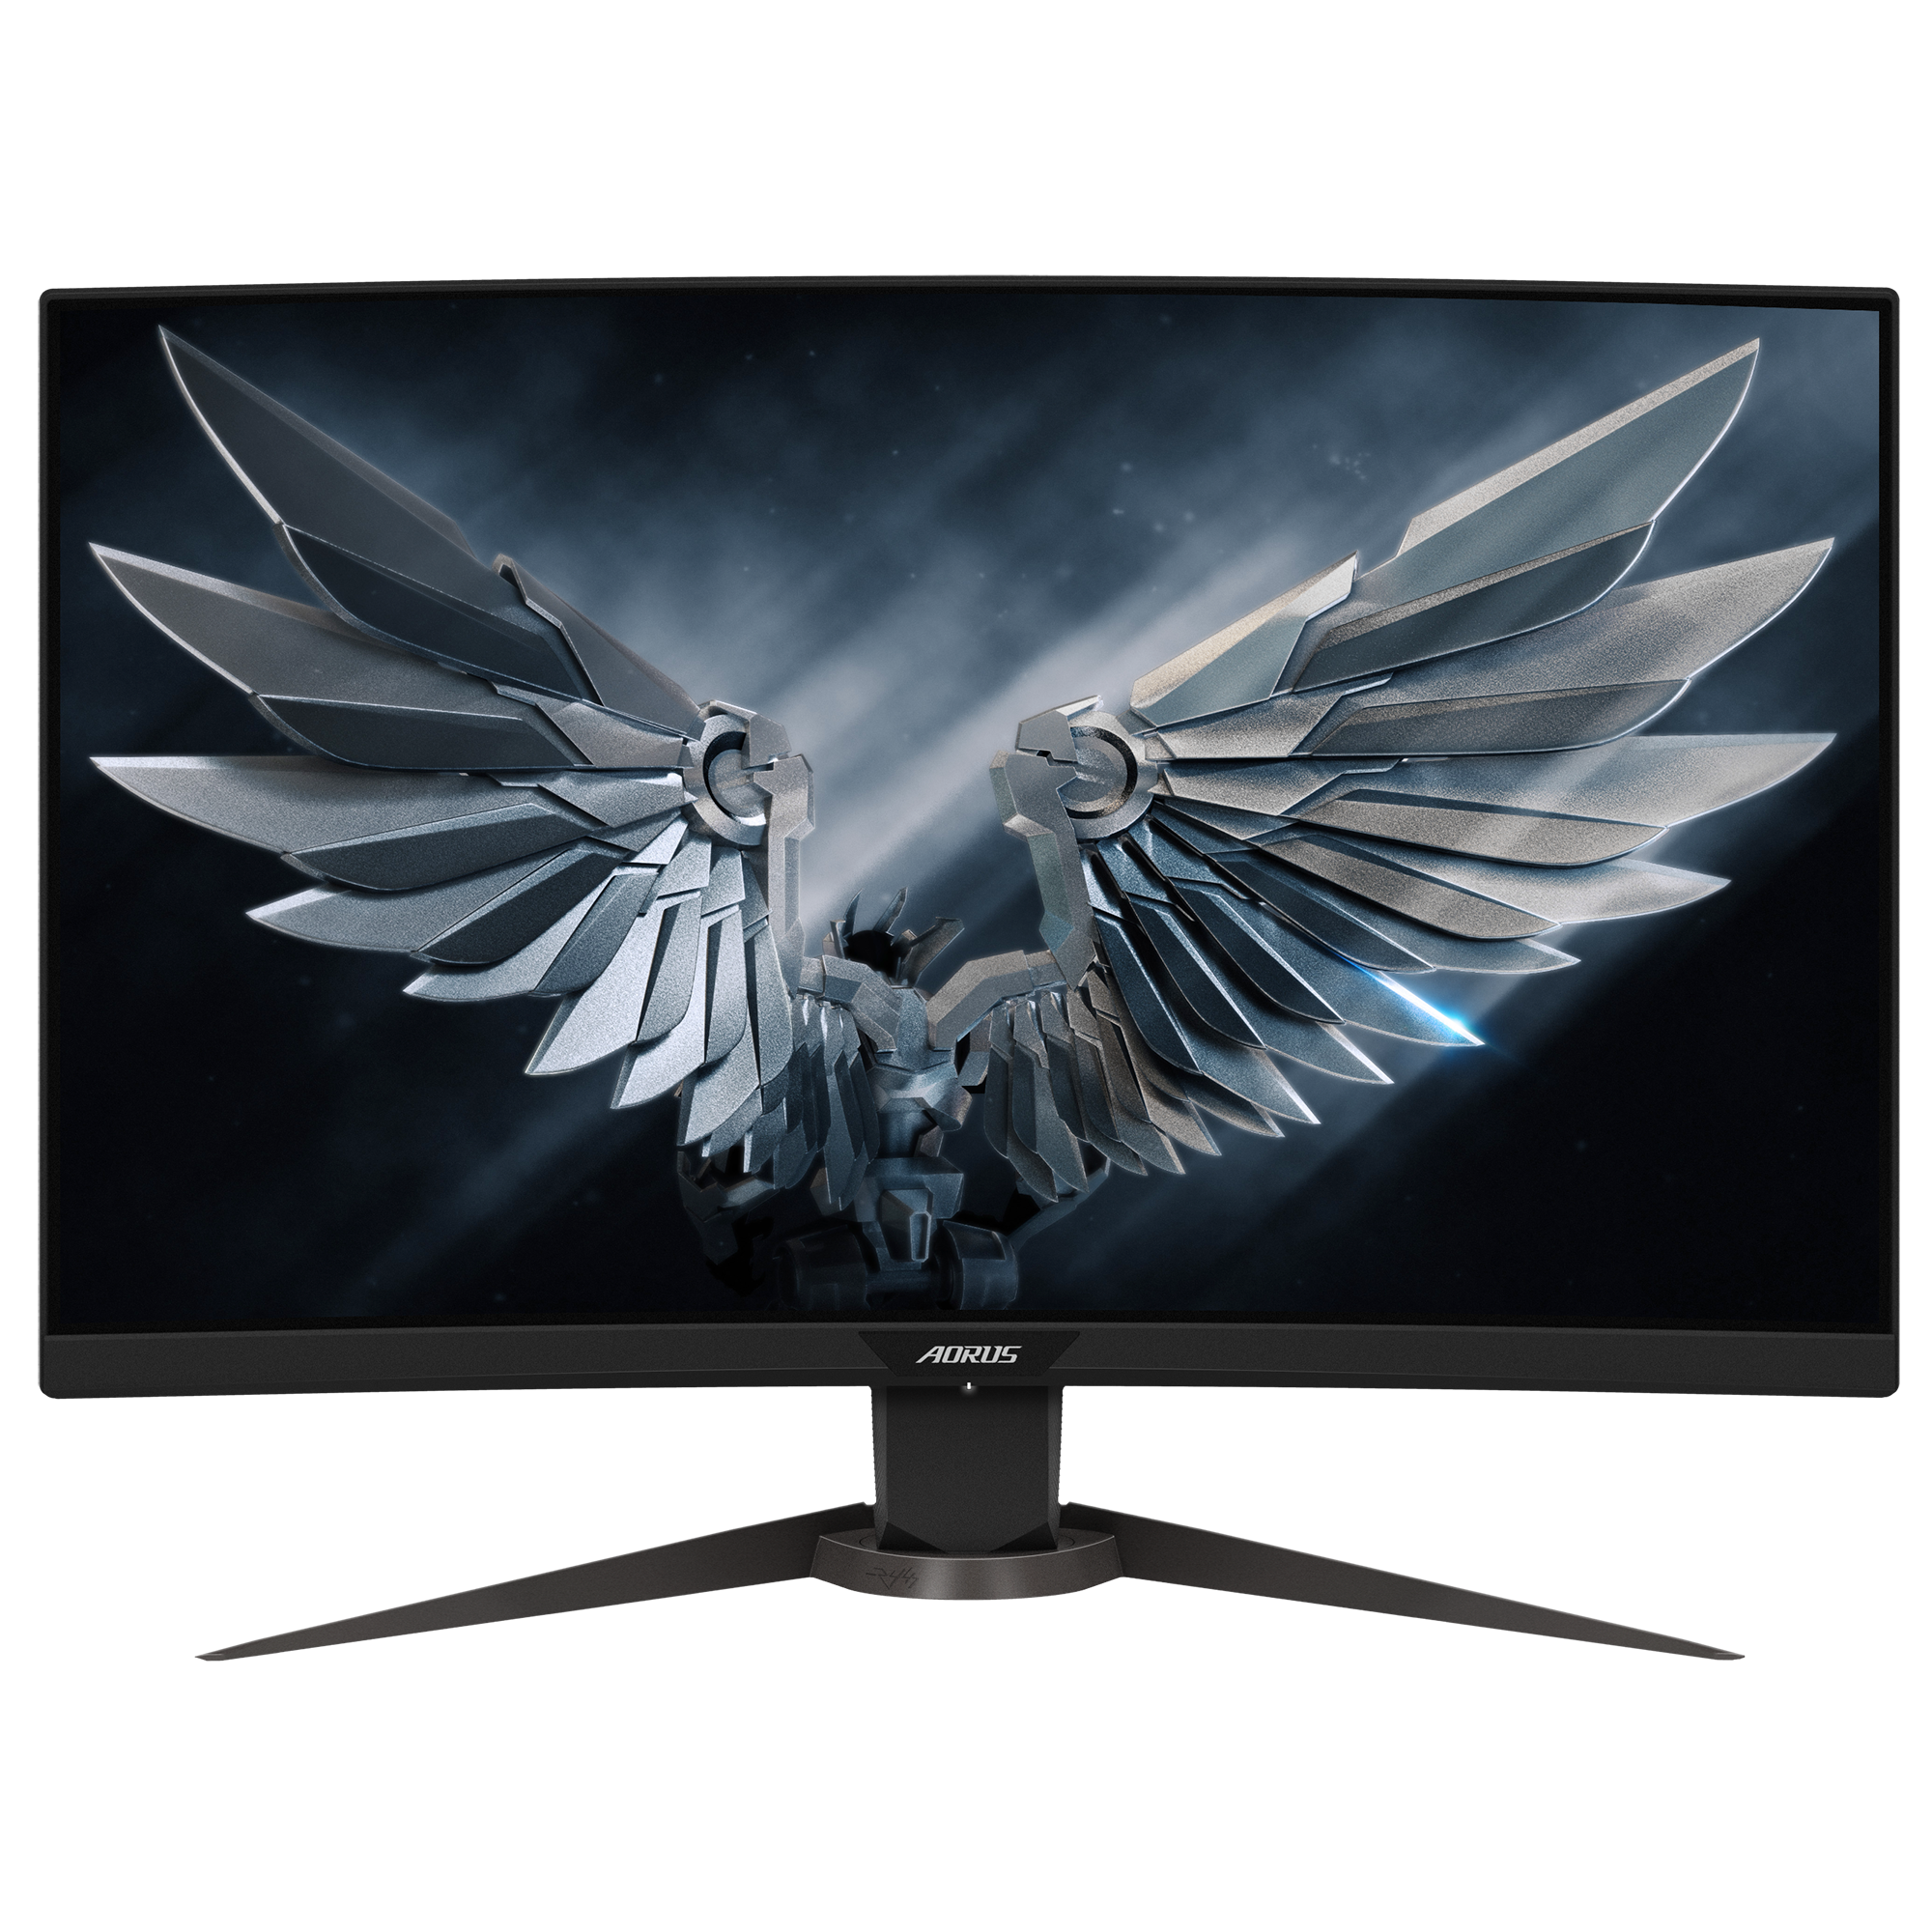 "Fotografie Monitor gaming curbat LED VA Gigabyte AORUS 27"", Full HD, DisplayPort, 165Hz, 1ms, Negru, CV27F"